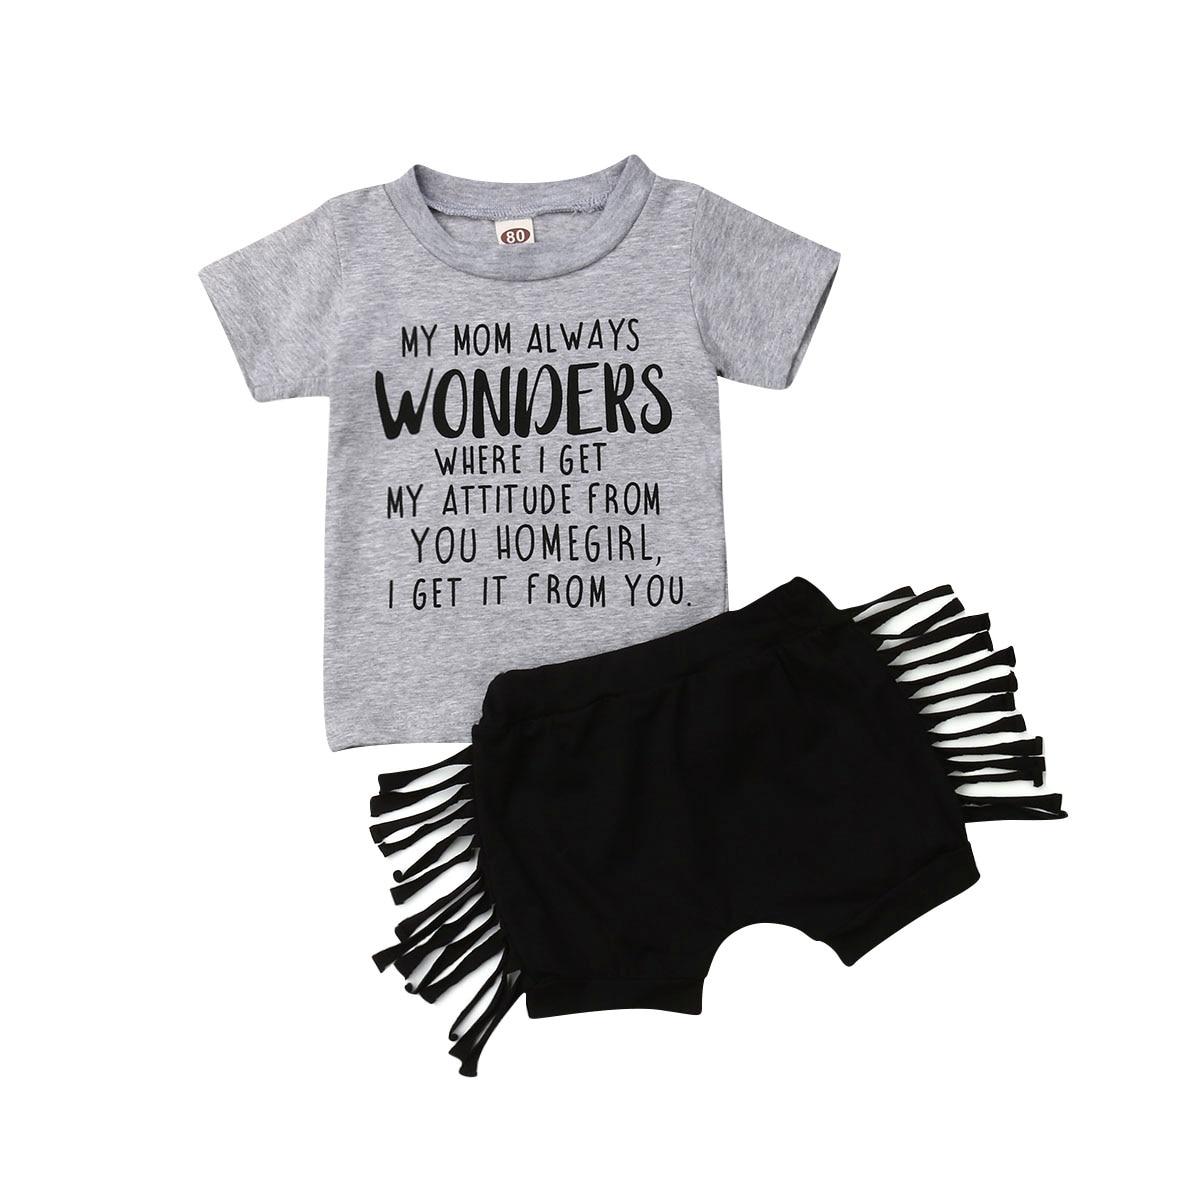 2019 verano niños bebé niña manga corta letra impresa camiseta Tops borla pantalones cortos pantalón Inferior 2 piezas ropa conjunto